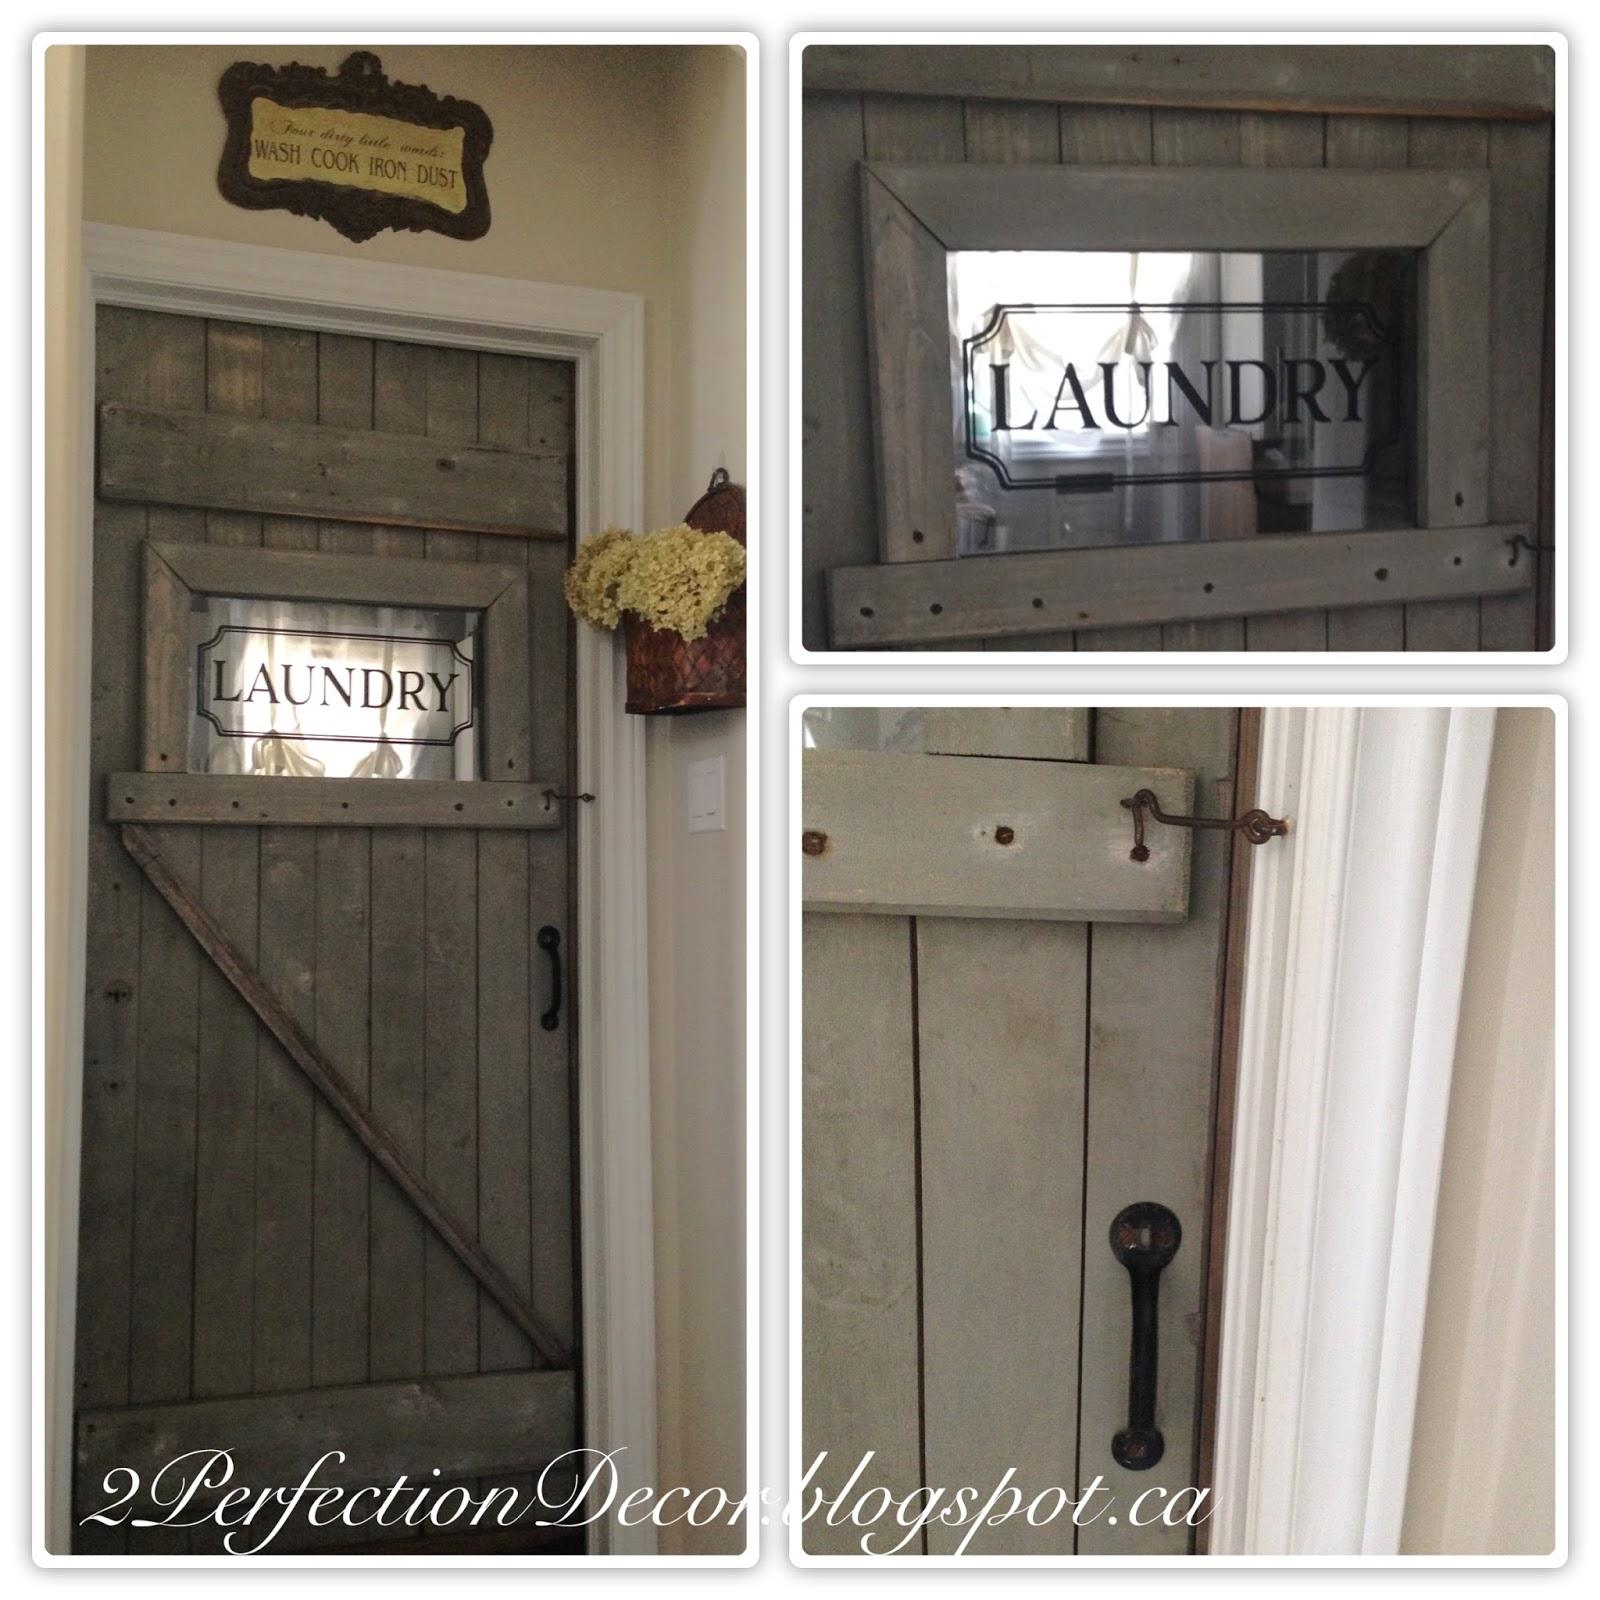 2Perfection Decor: Antique Barn Door as our Laundry room door